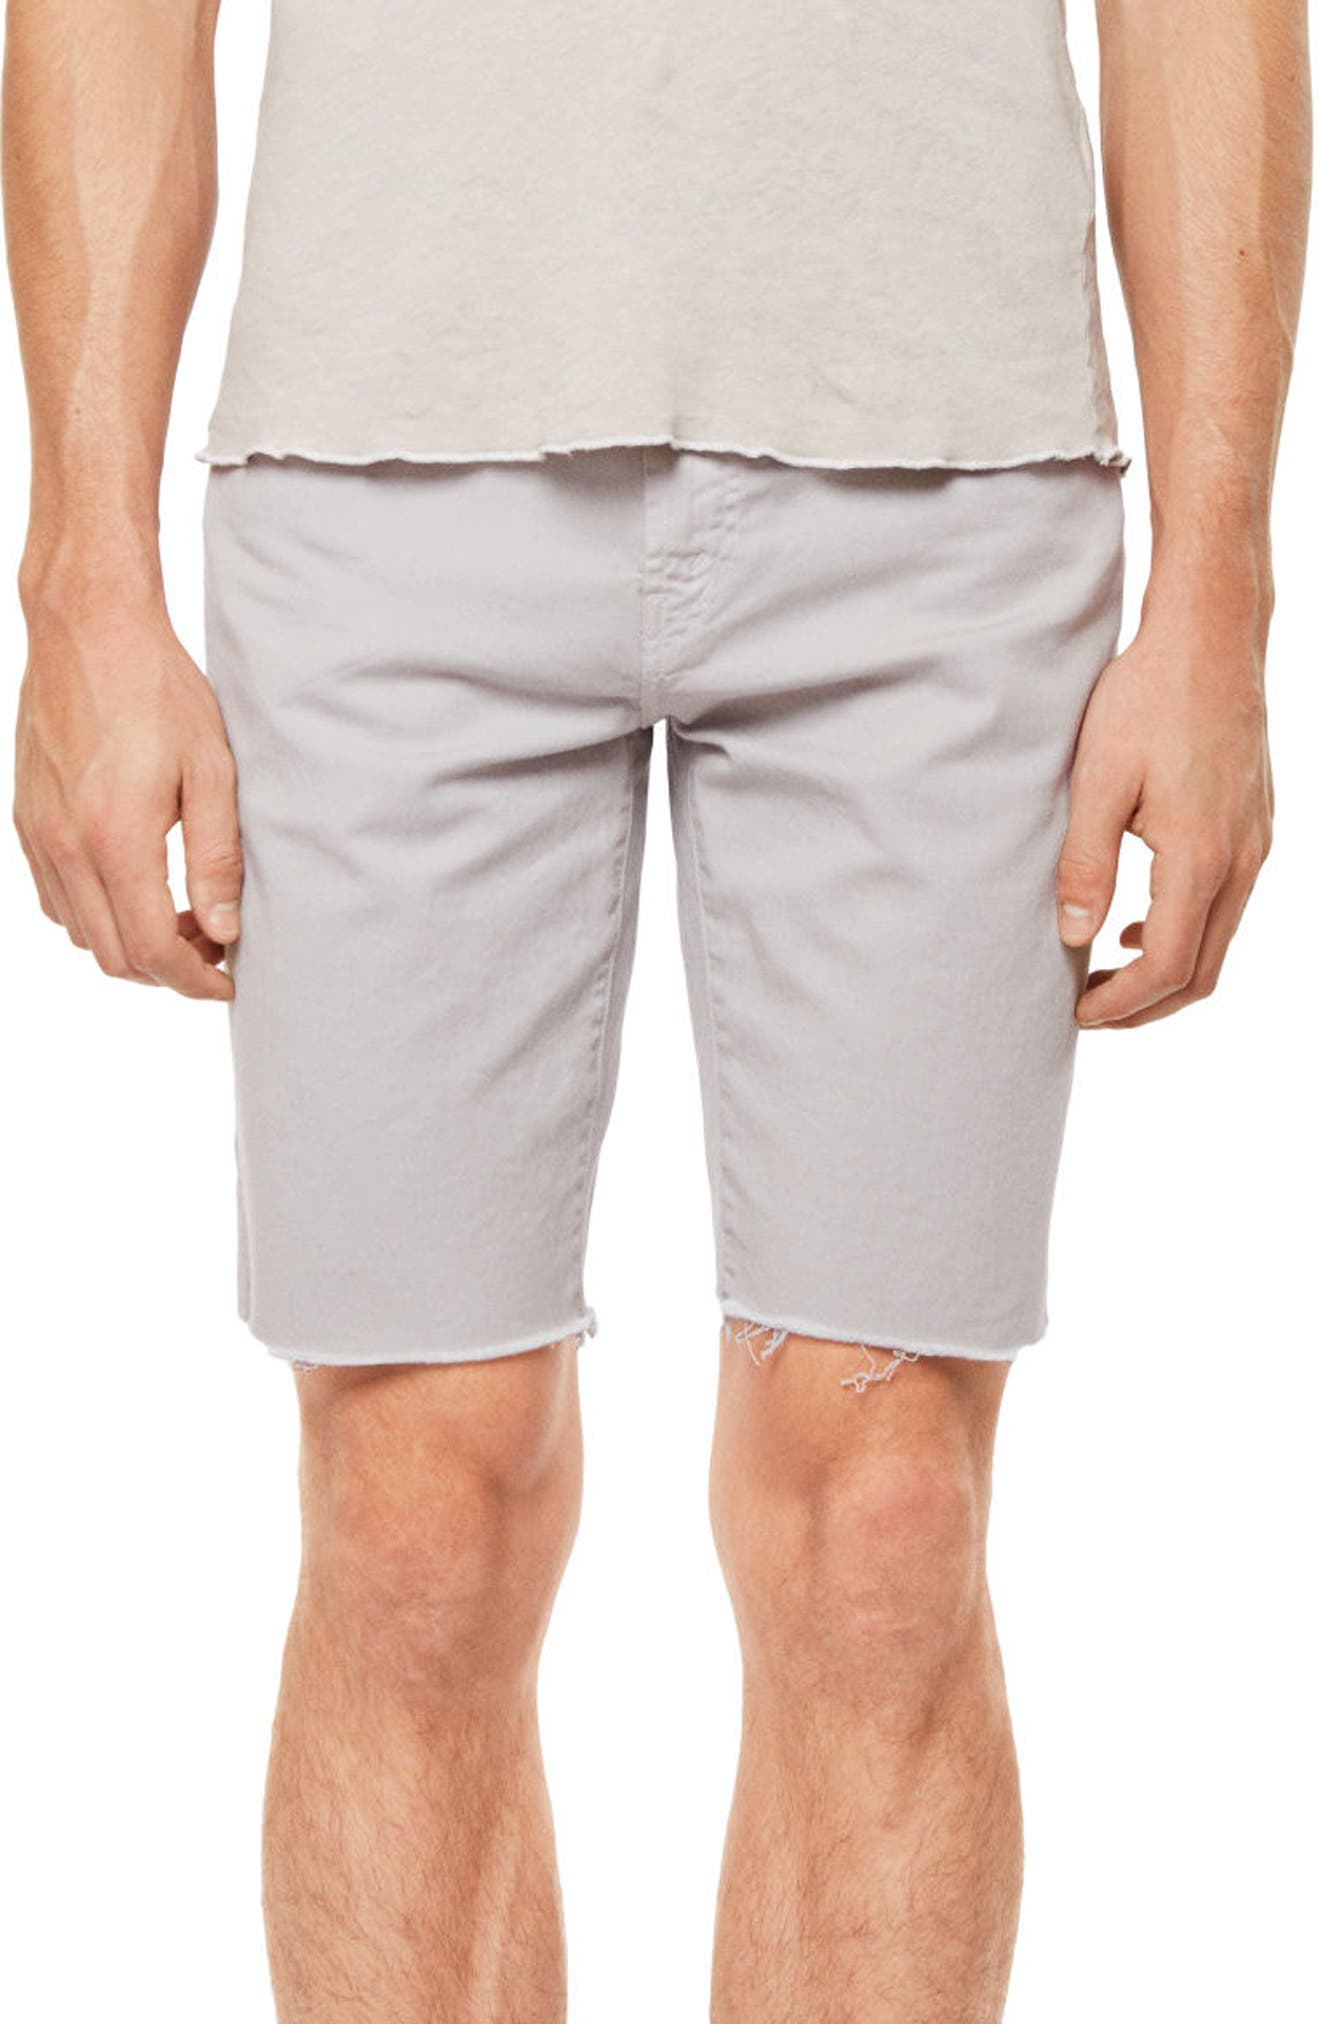 Eli Cutoff Denim Shorts,                             Main thumbnail 1, color,                             100